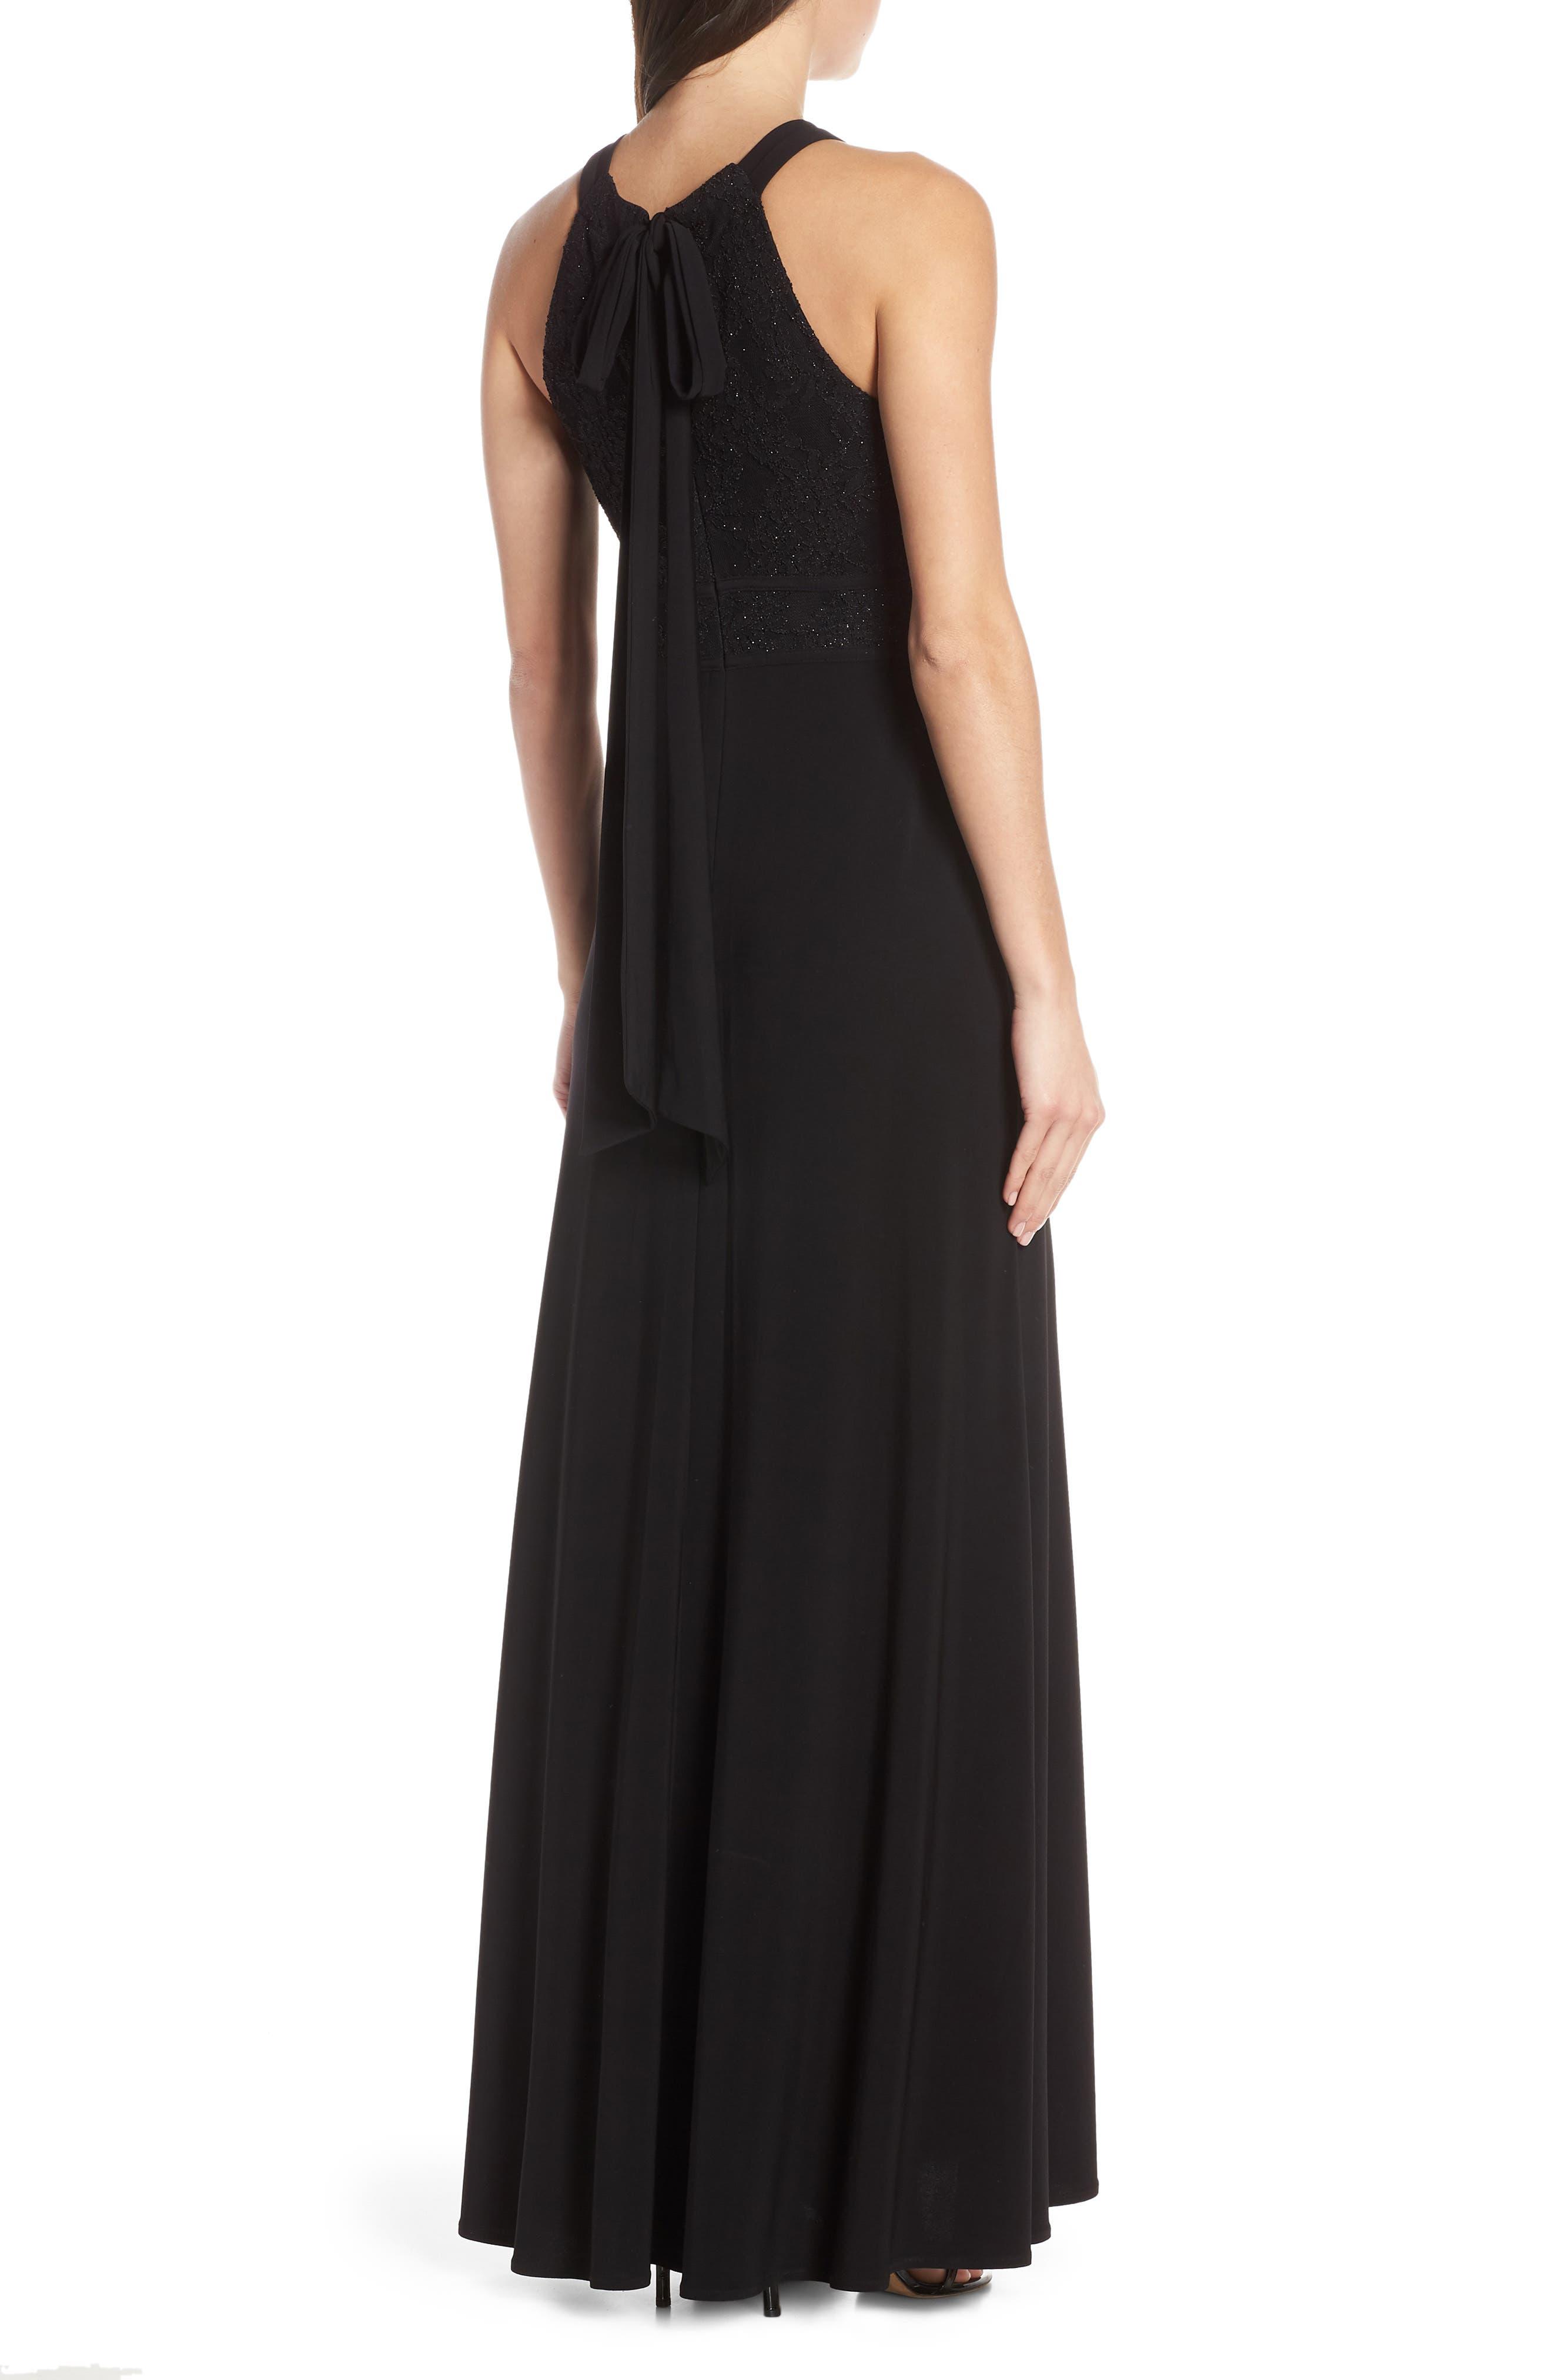 MORGAN & CO.,                             Pleat Lace Bodice Evening Dress,                             Alternate thumbnail 2, color,                             BLACK